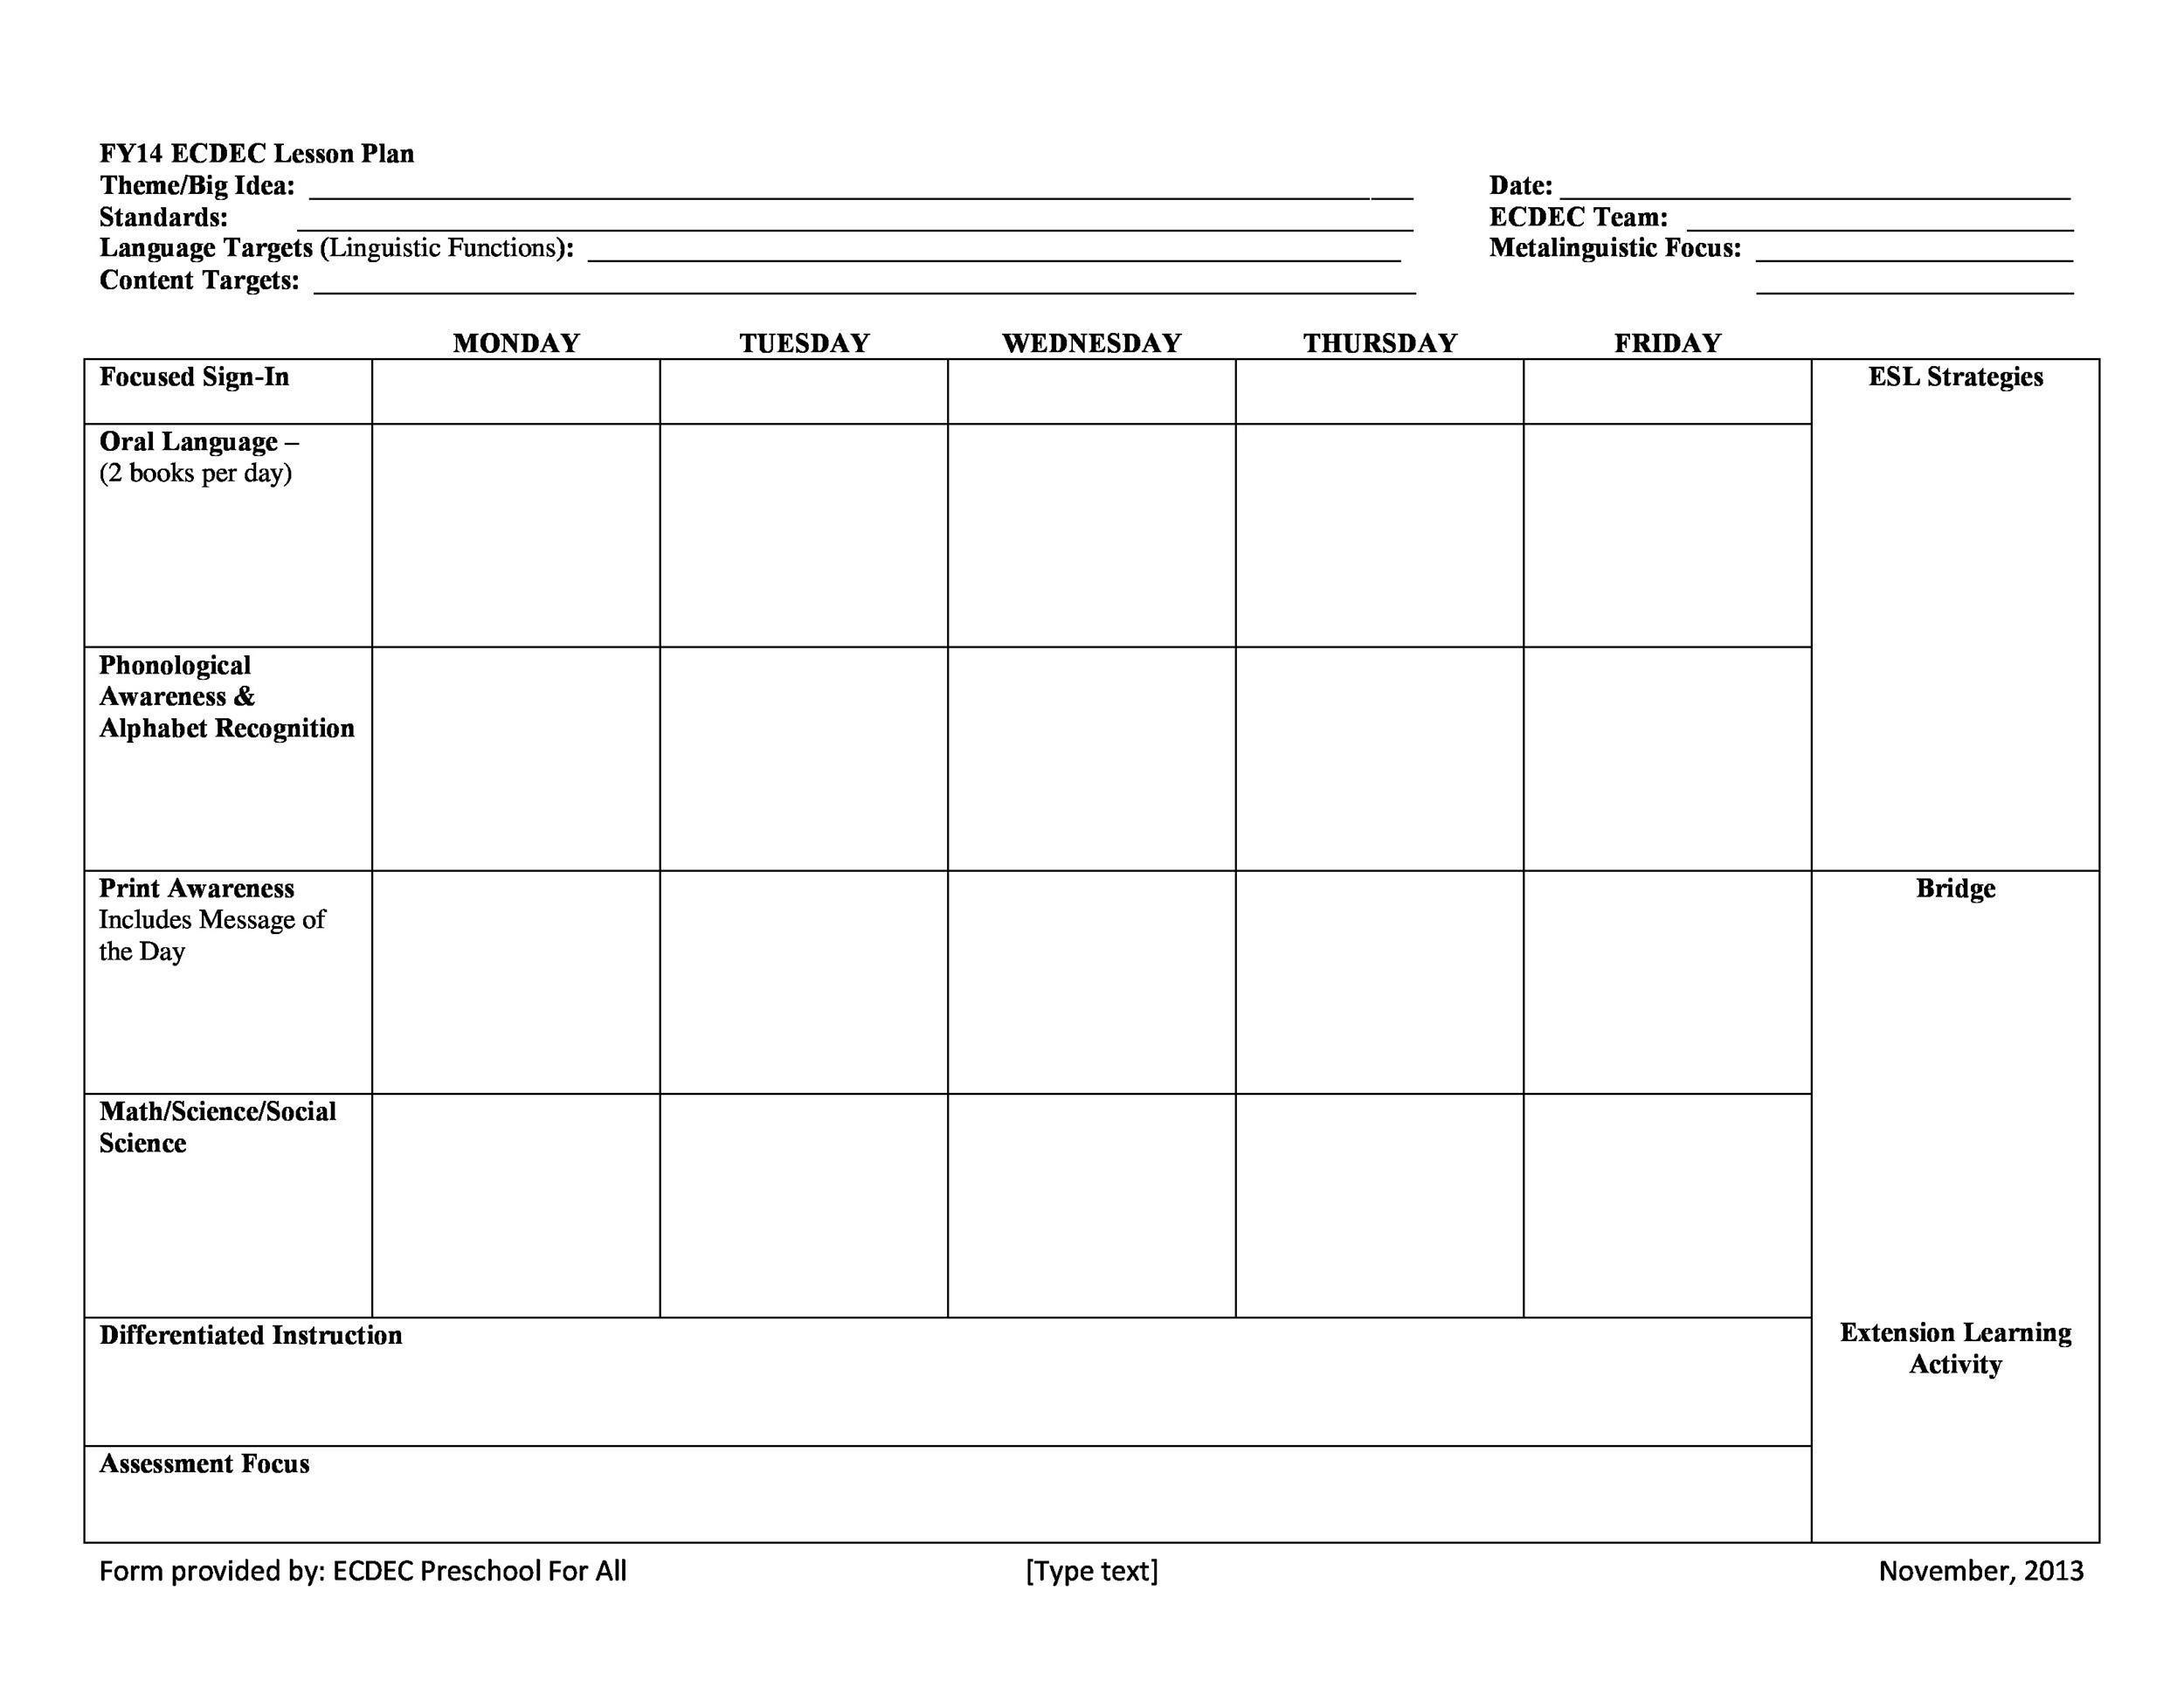 008 Impressive Free Editable Weekly Lesson Plan Template Pdf Example  BlankFull